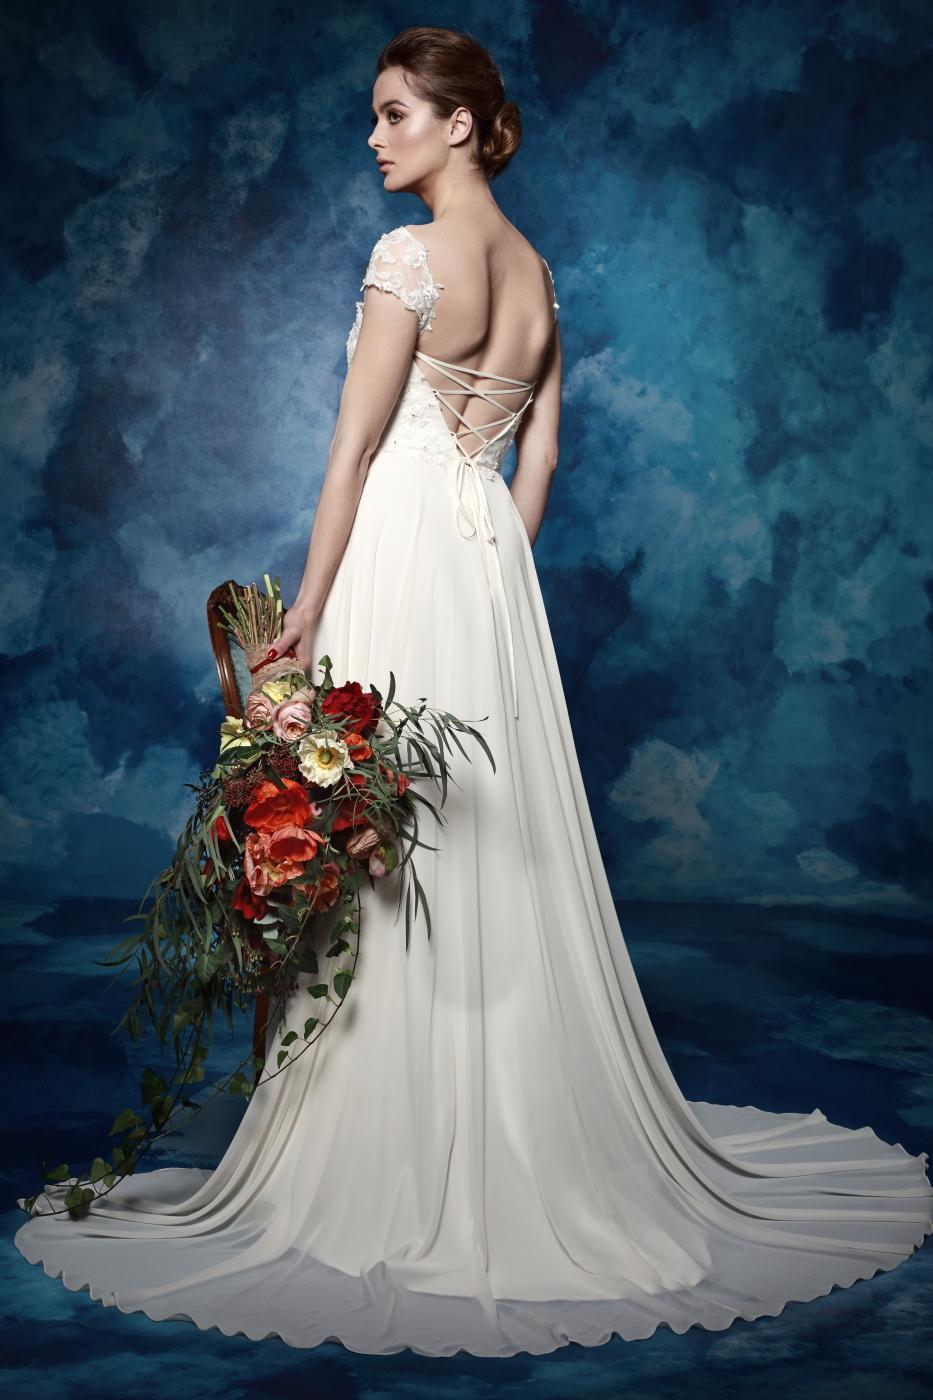 Daisy B Nell Bridal Blog Evesham